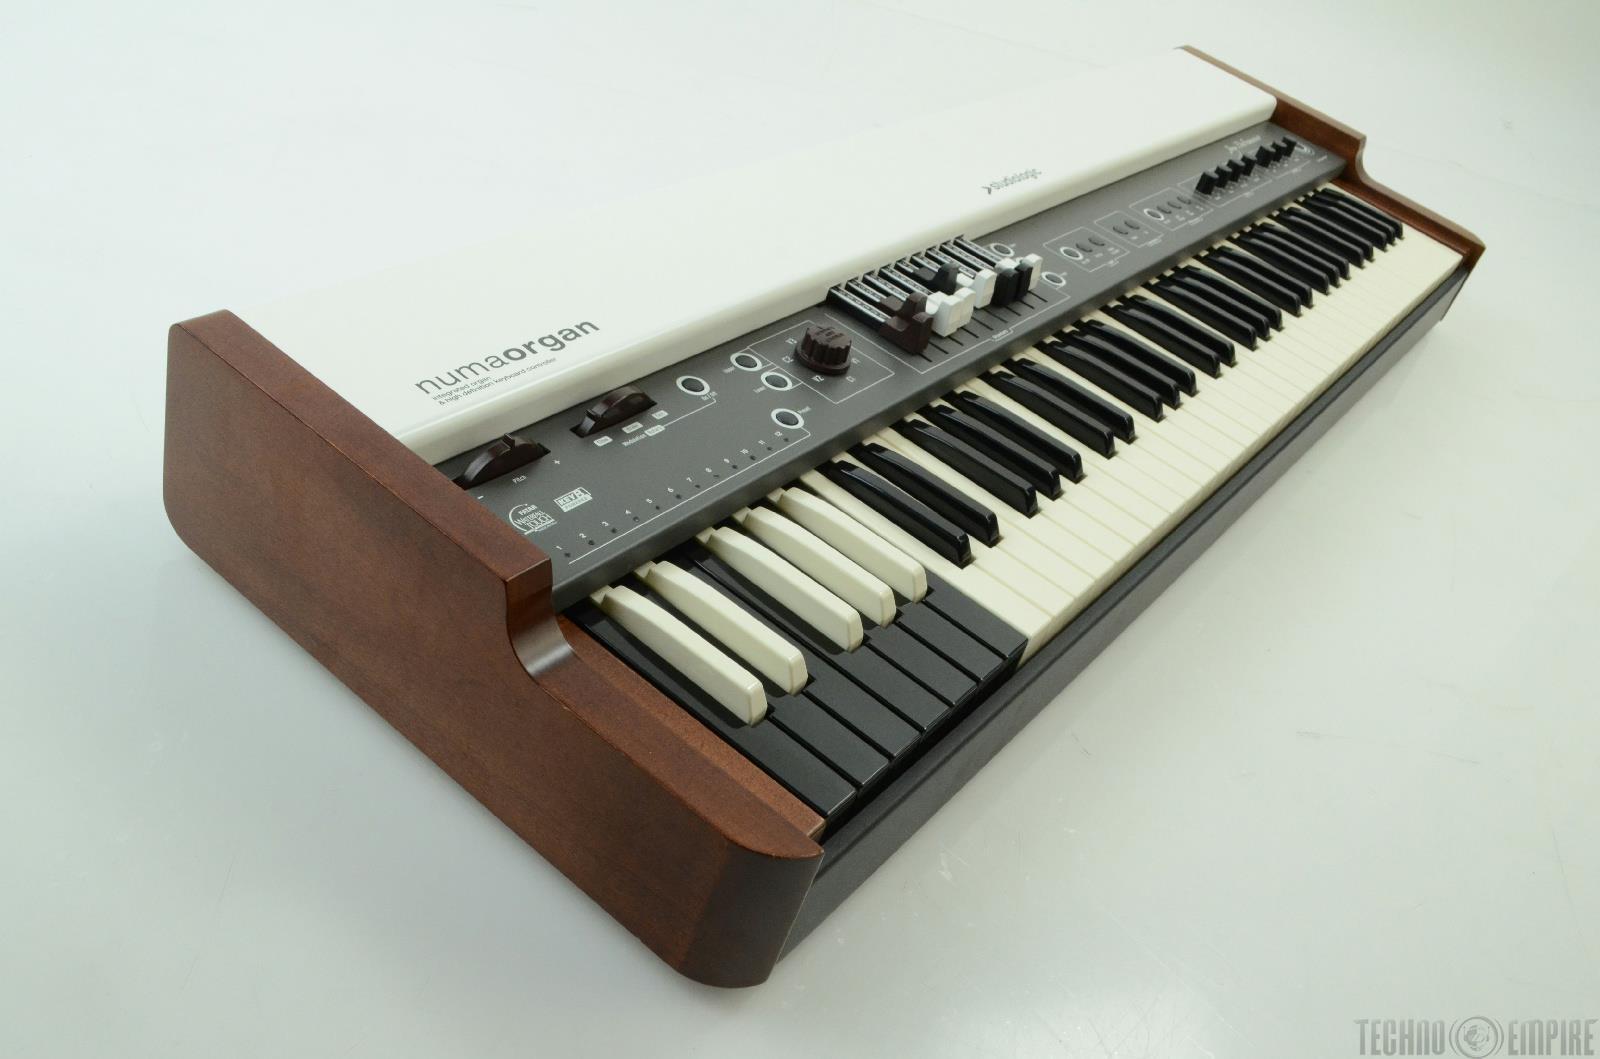 studiologic numa organ integrated organ hd keyboard controller new 20716 ebay. Black Bedroom Furniture Sets. Home Design Ideas